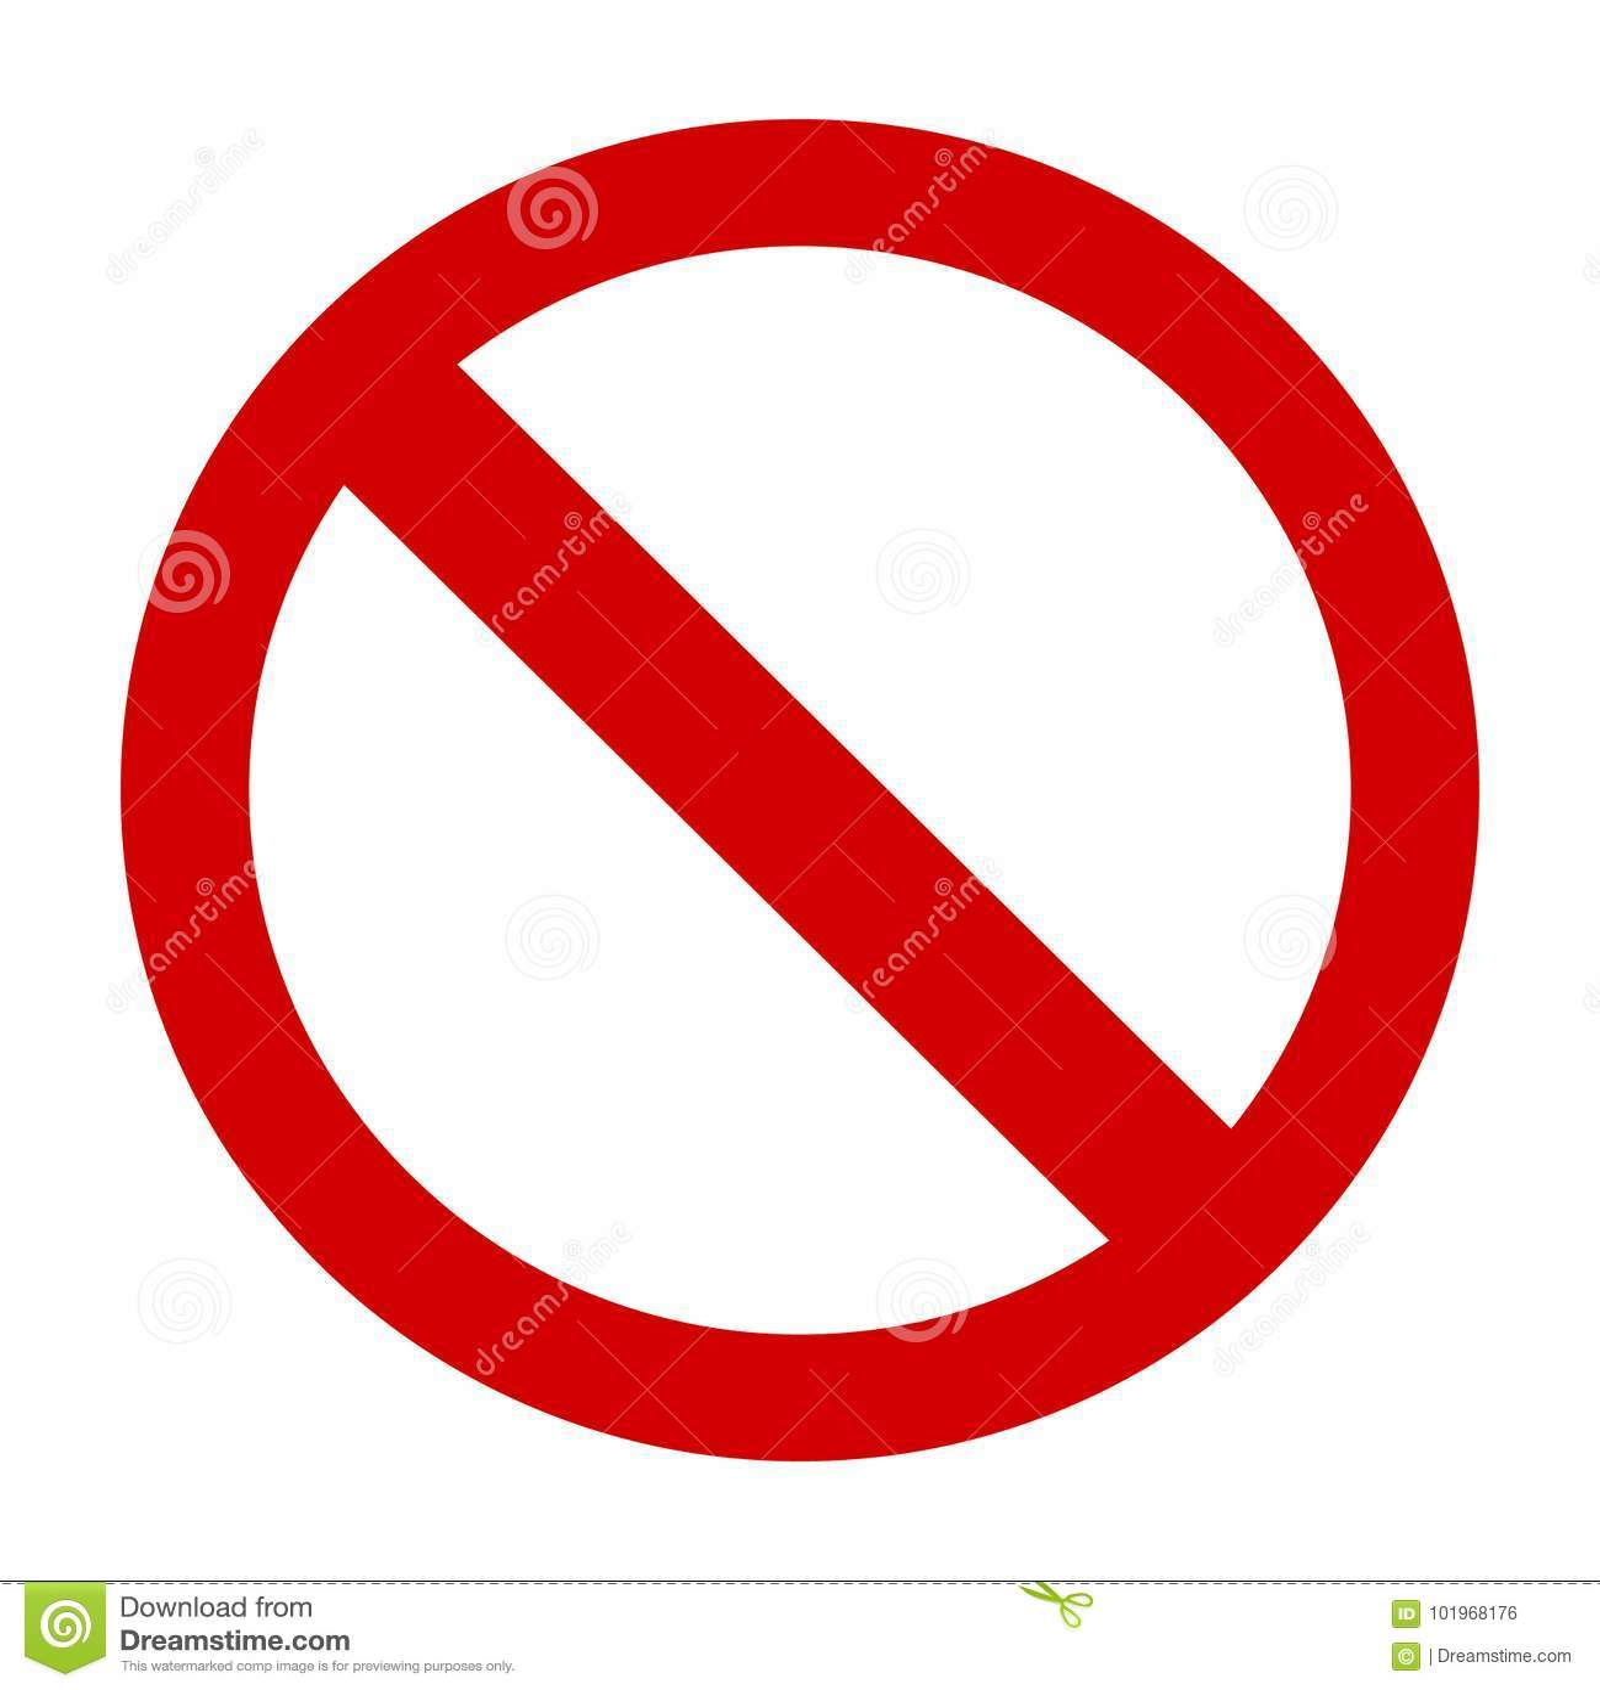 Знак запрета или отсутствие вектор значка знака простые